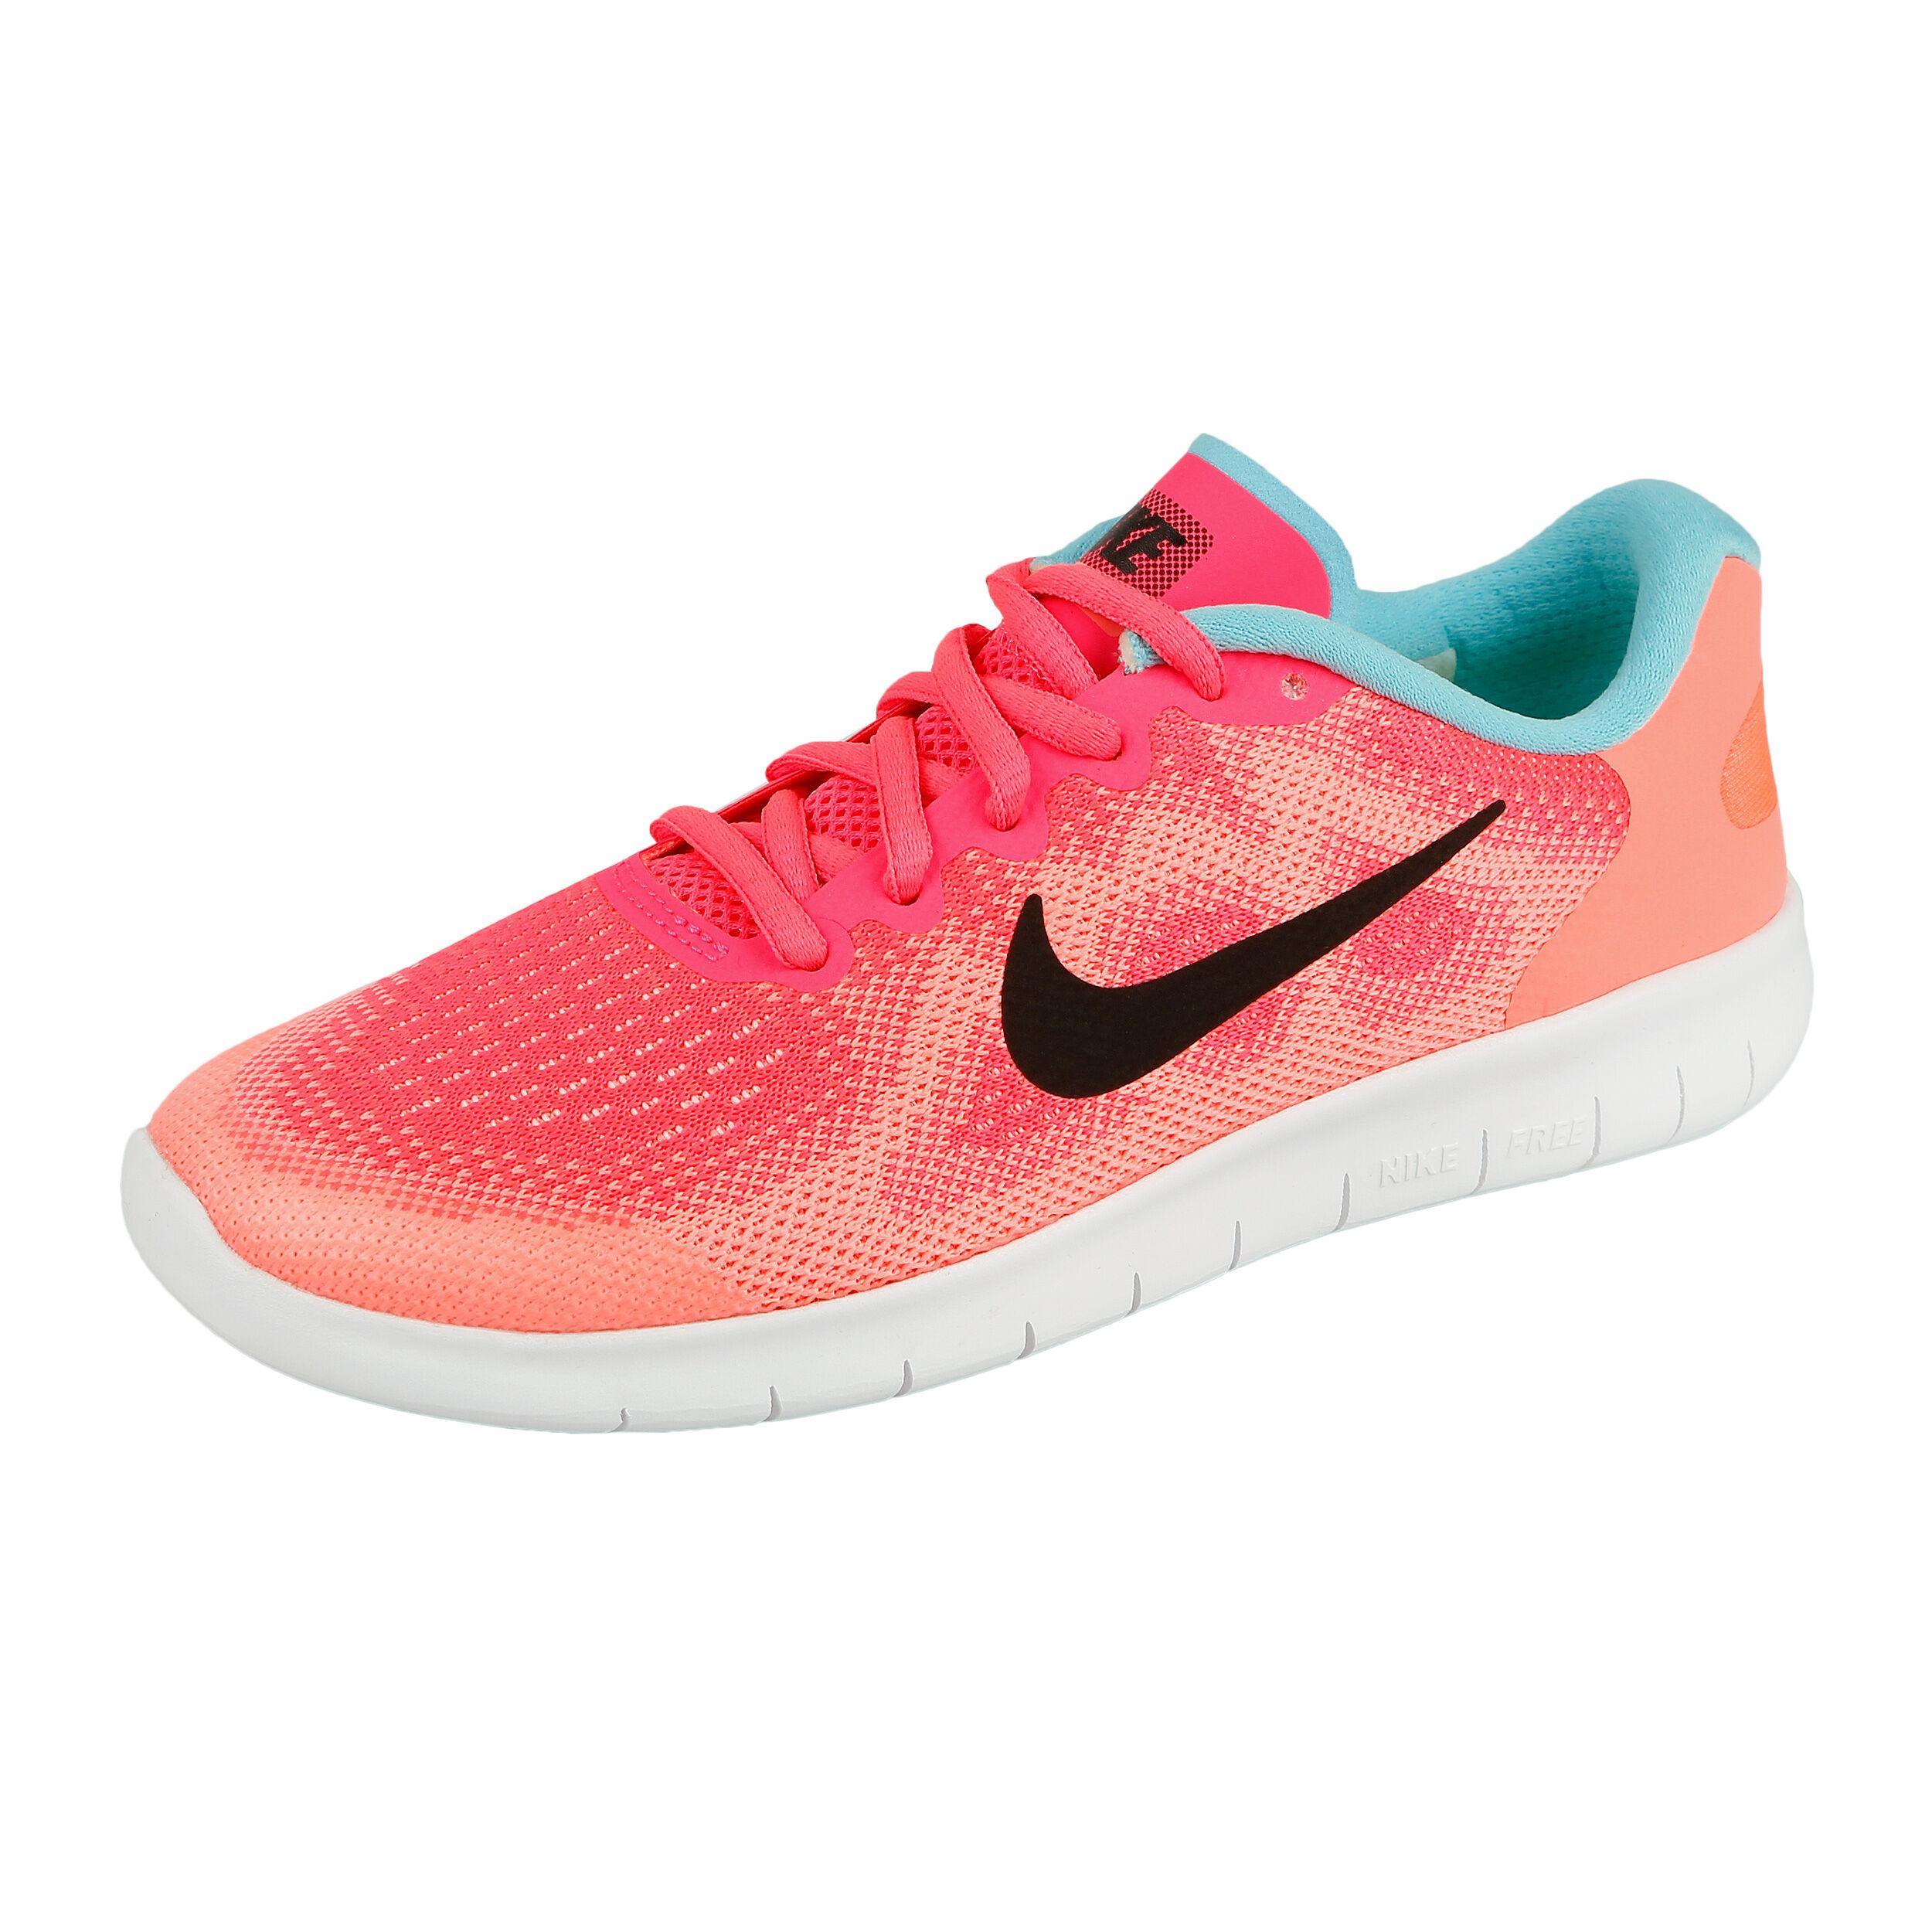 2017 Online Kaufen Nike Free Run 2 Gs Schuhe Schwarz Rosa